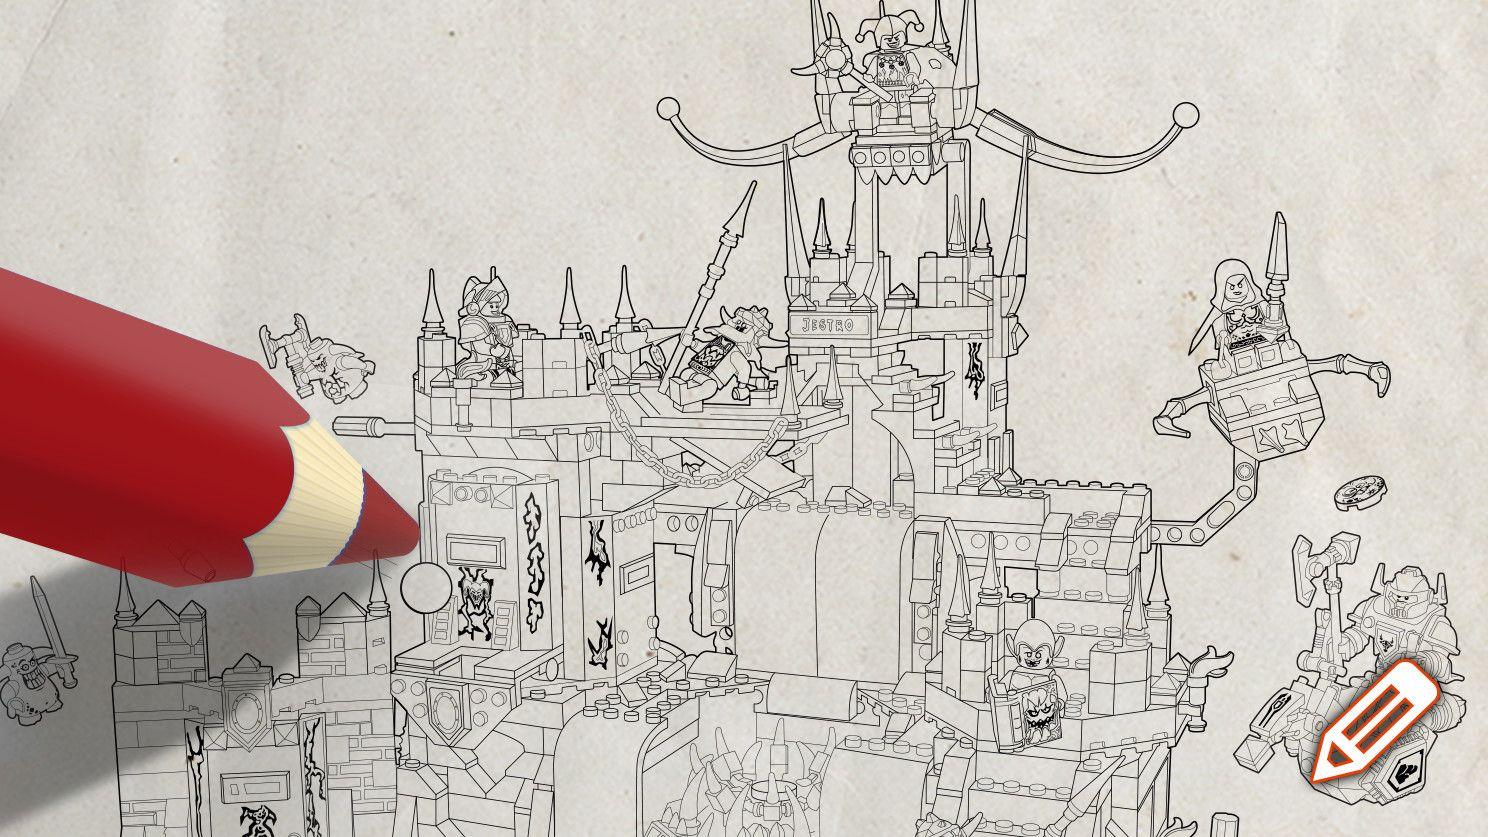 70323 Jestro Vulkani Buvohelye Lego Coloring Pages Ninjago Coloring Pages Coloring Pages Inspirational